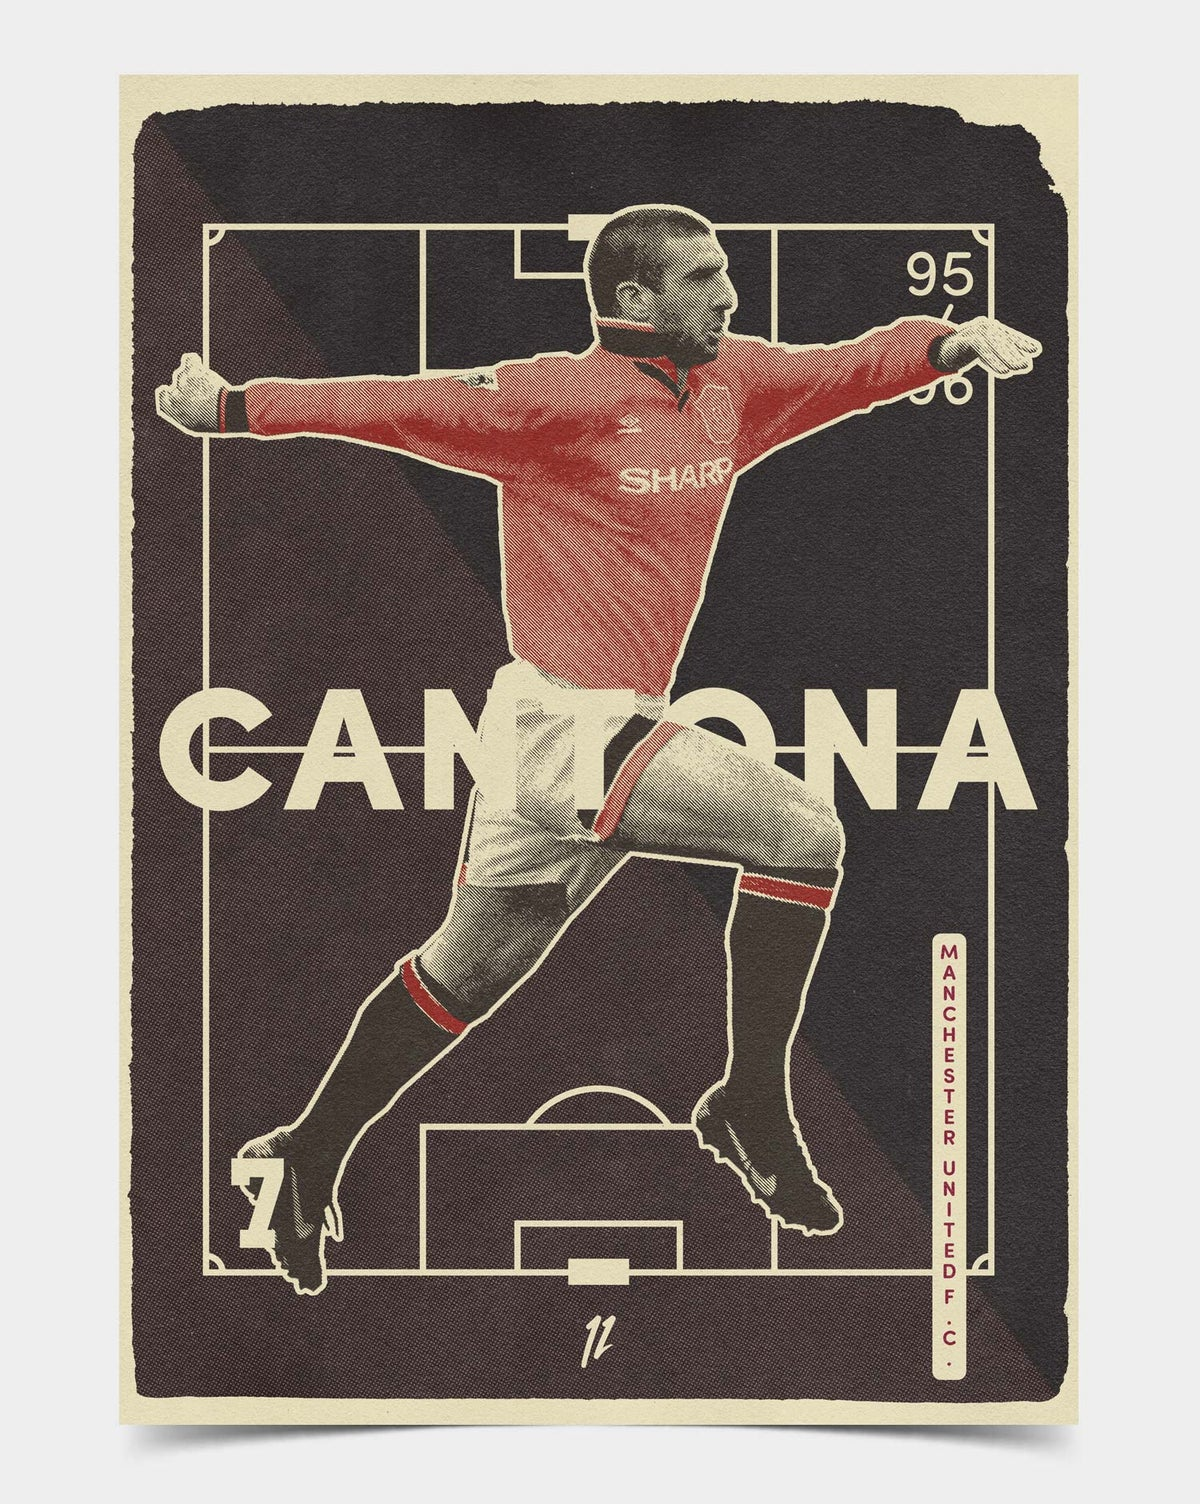 Image of Cantona Retro